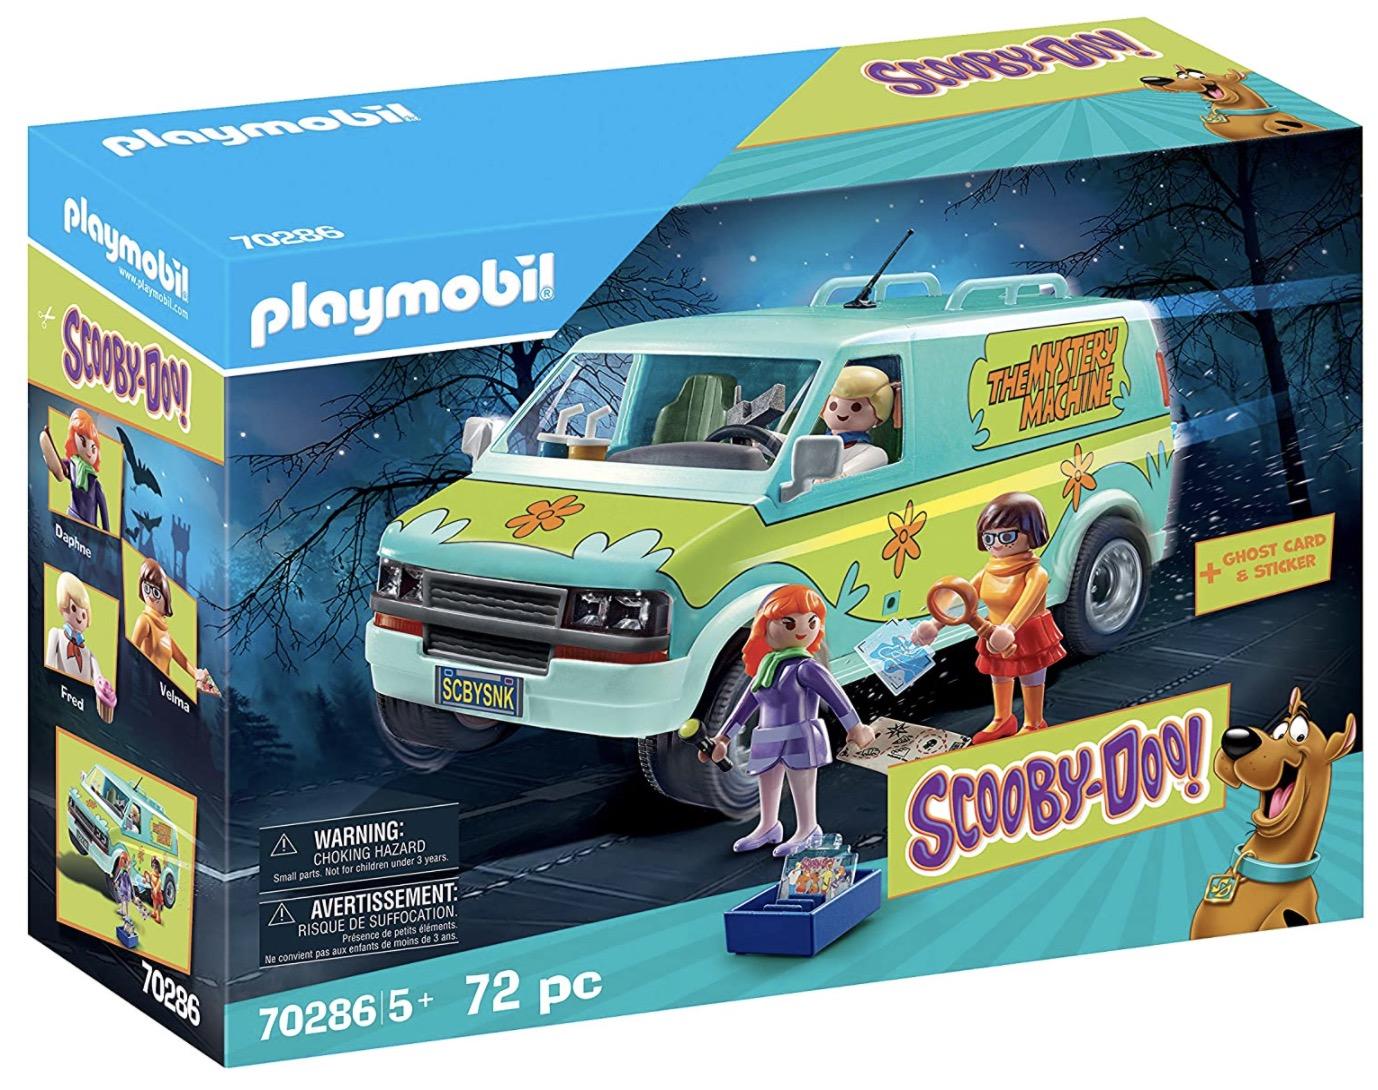 Code promo Amazon : Playmobil - Scooby-Doo! Mystery Machine - 70286 à 45,99€